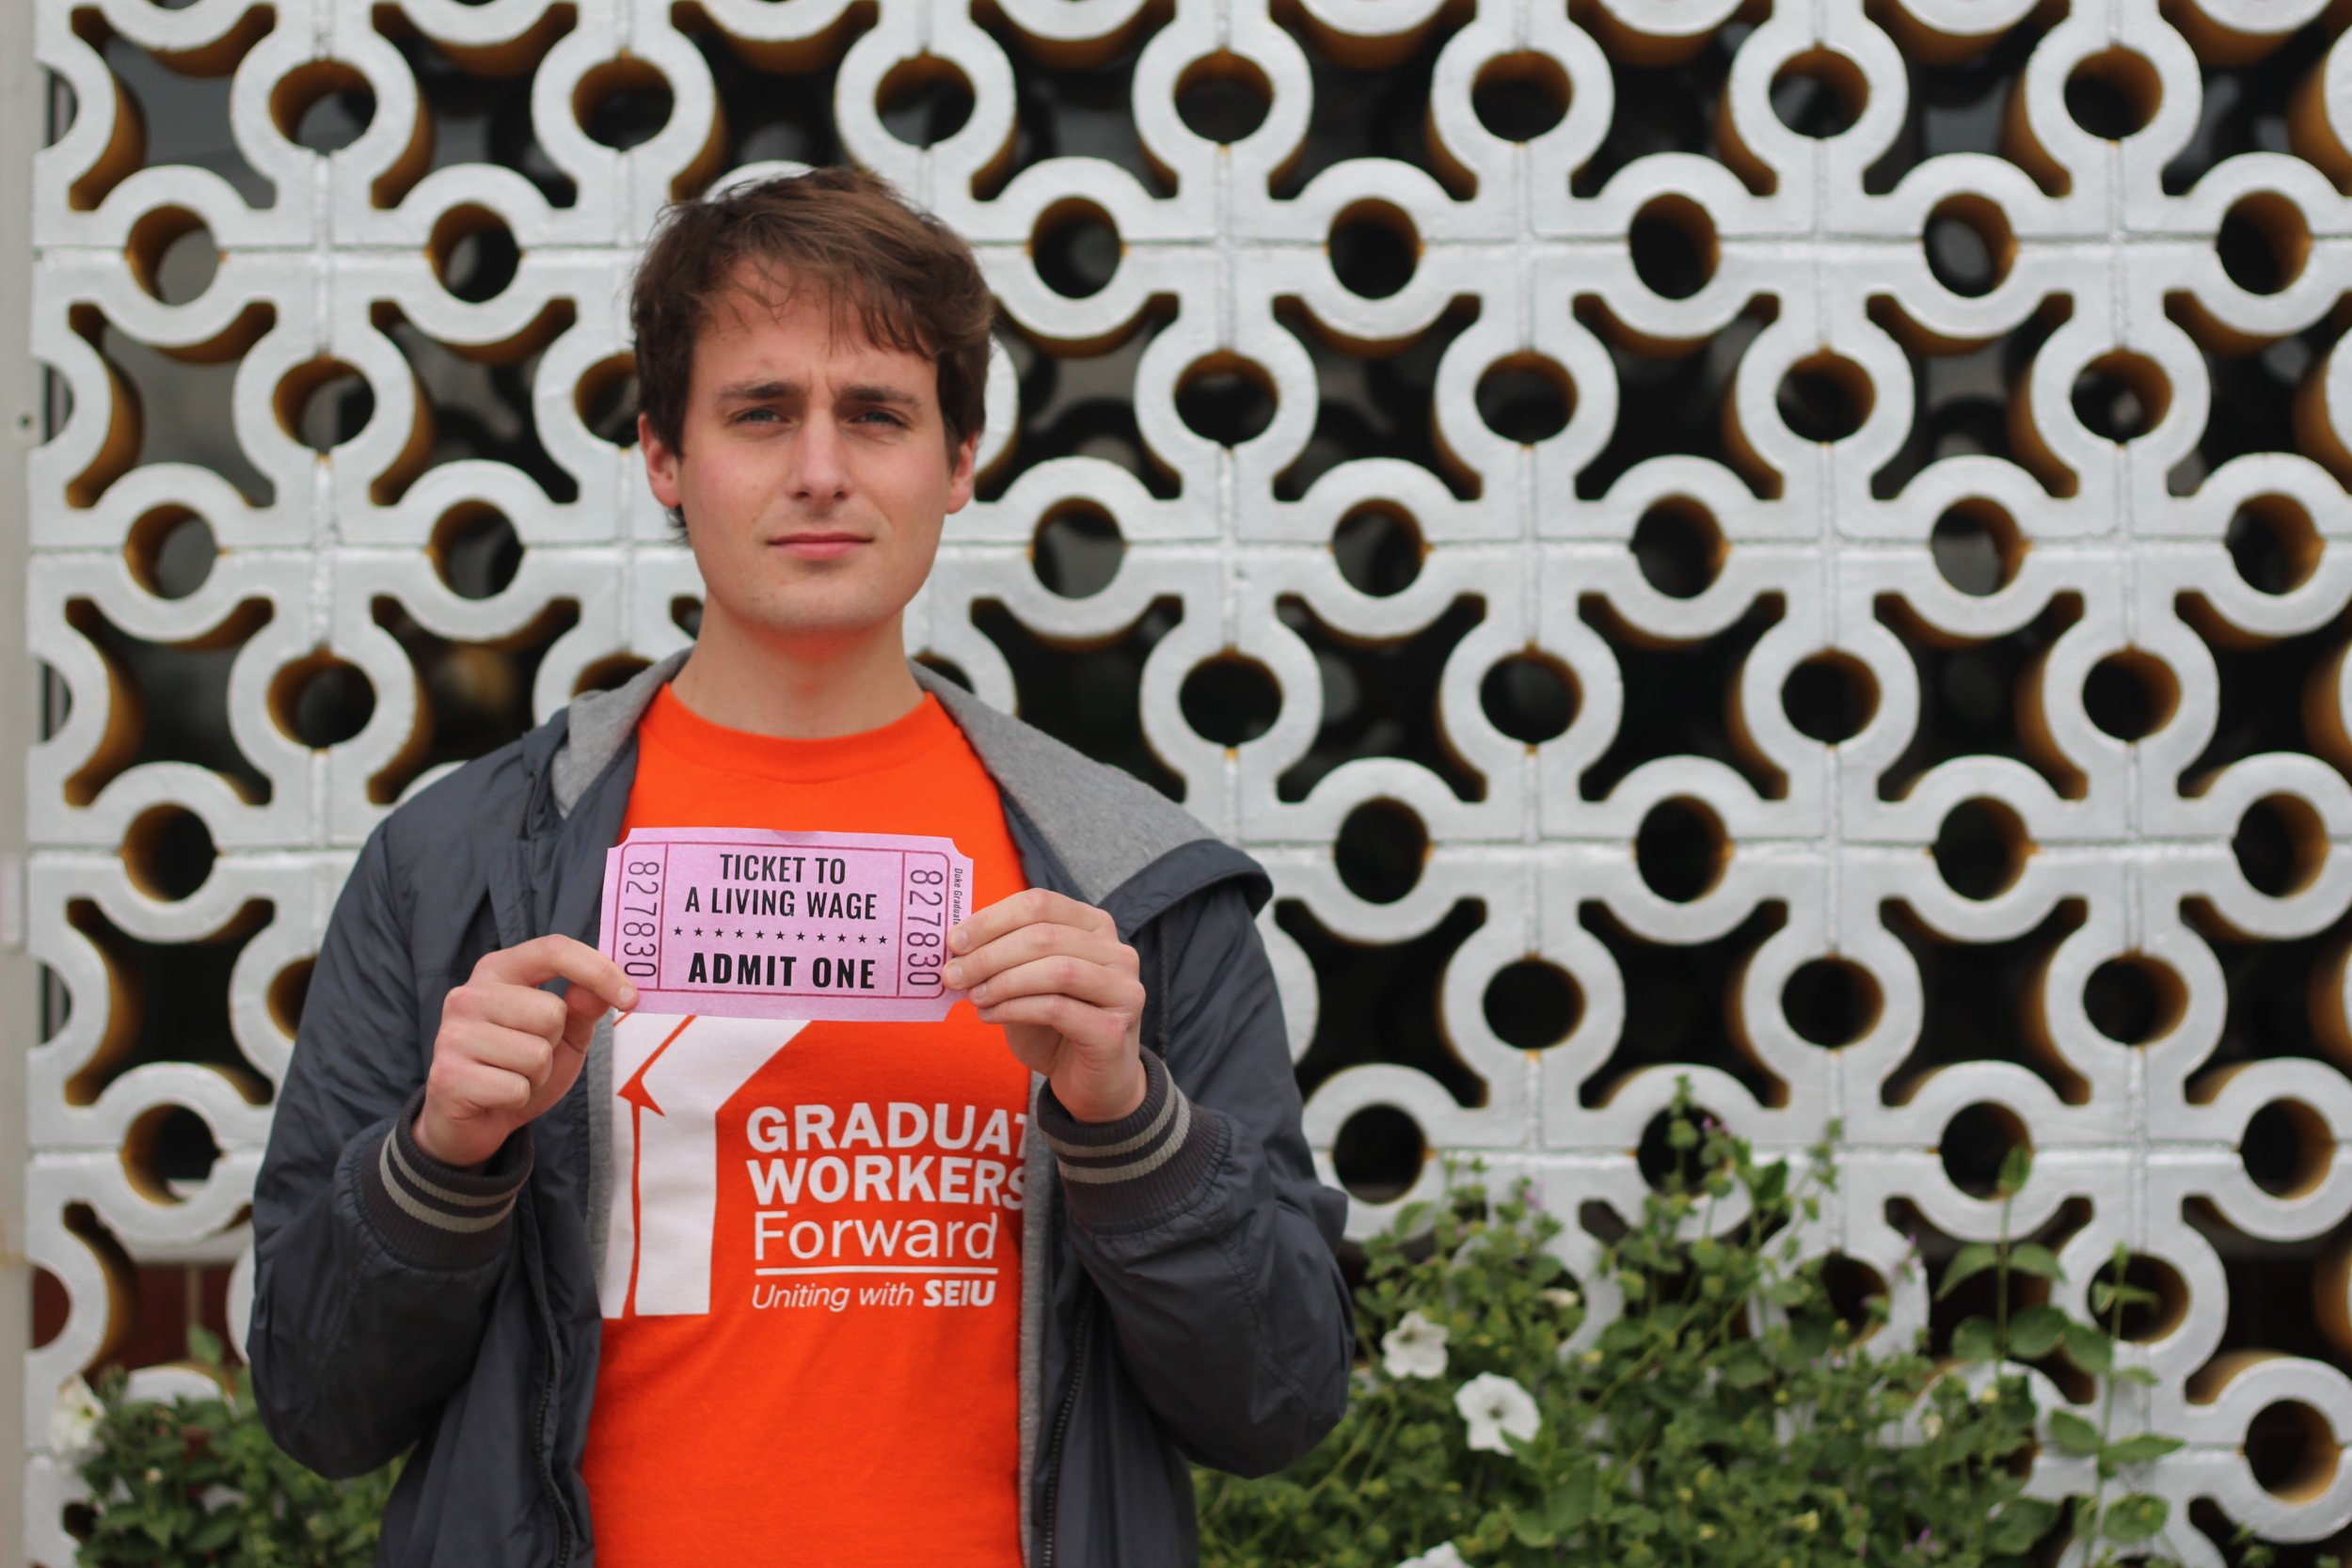 Duke University graduate student union living wage